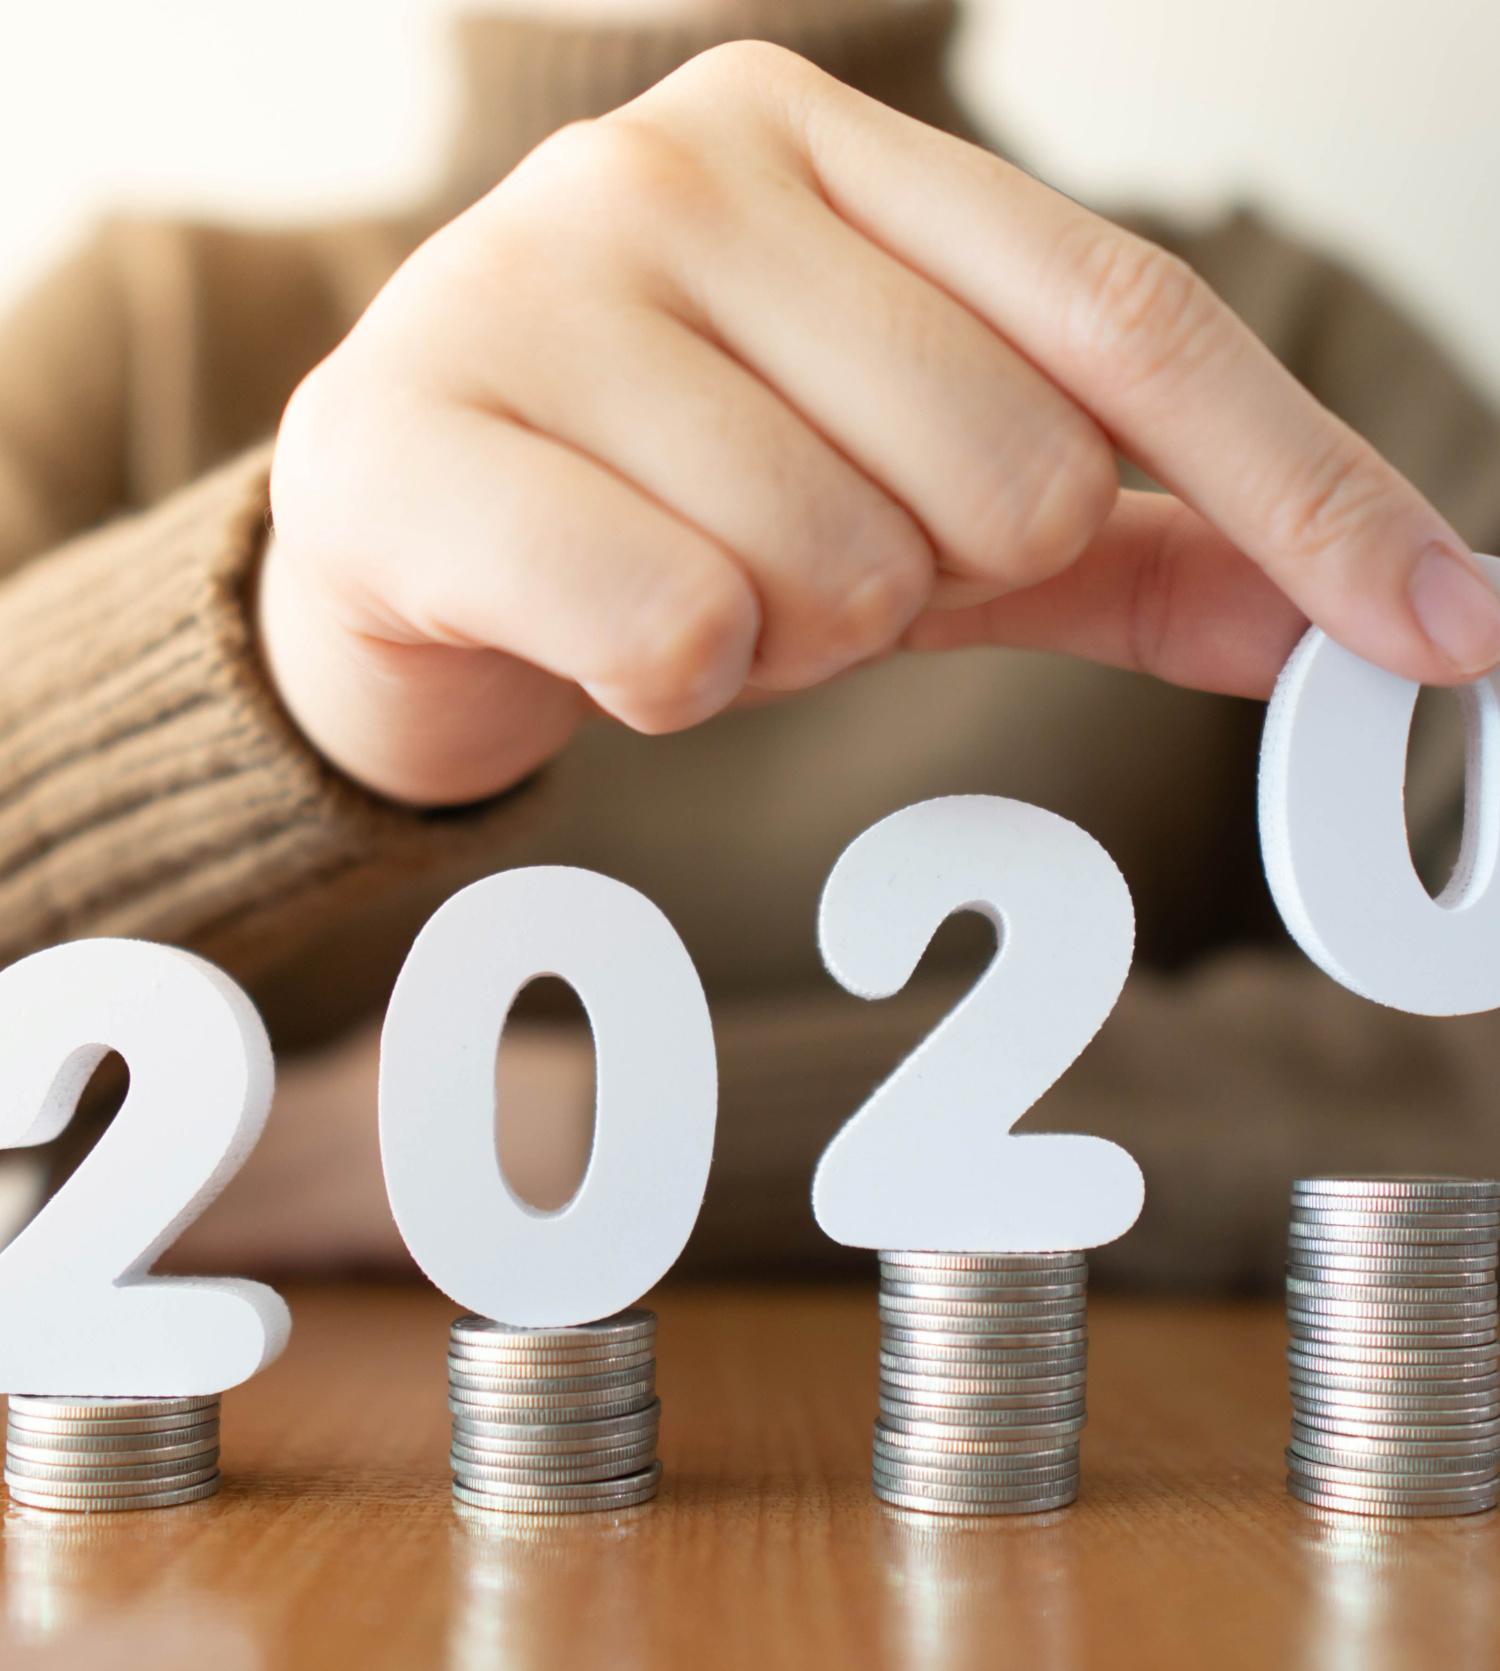 Money Business: Crush It In 2020